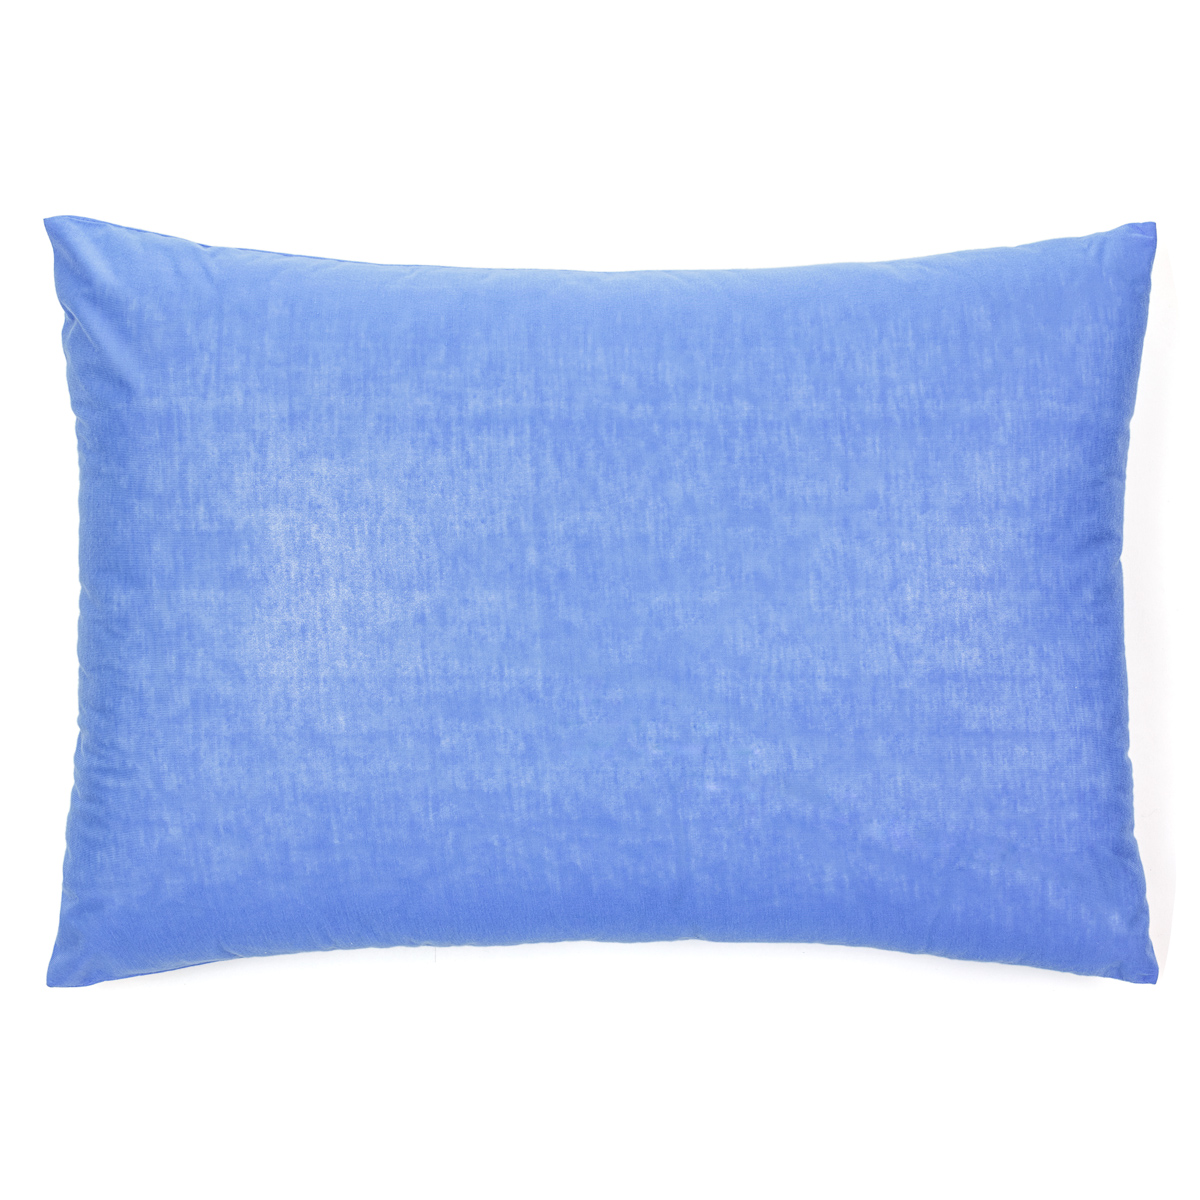 Наволочки Эко-сон Белый р. 68х68Для комфортного сна, отдыха и работы<br><br><br>Тип: Наволочки<br>Размер: 68х68<br>Материал: Тенсел